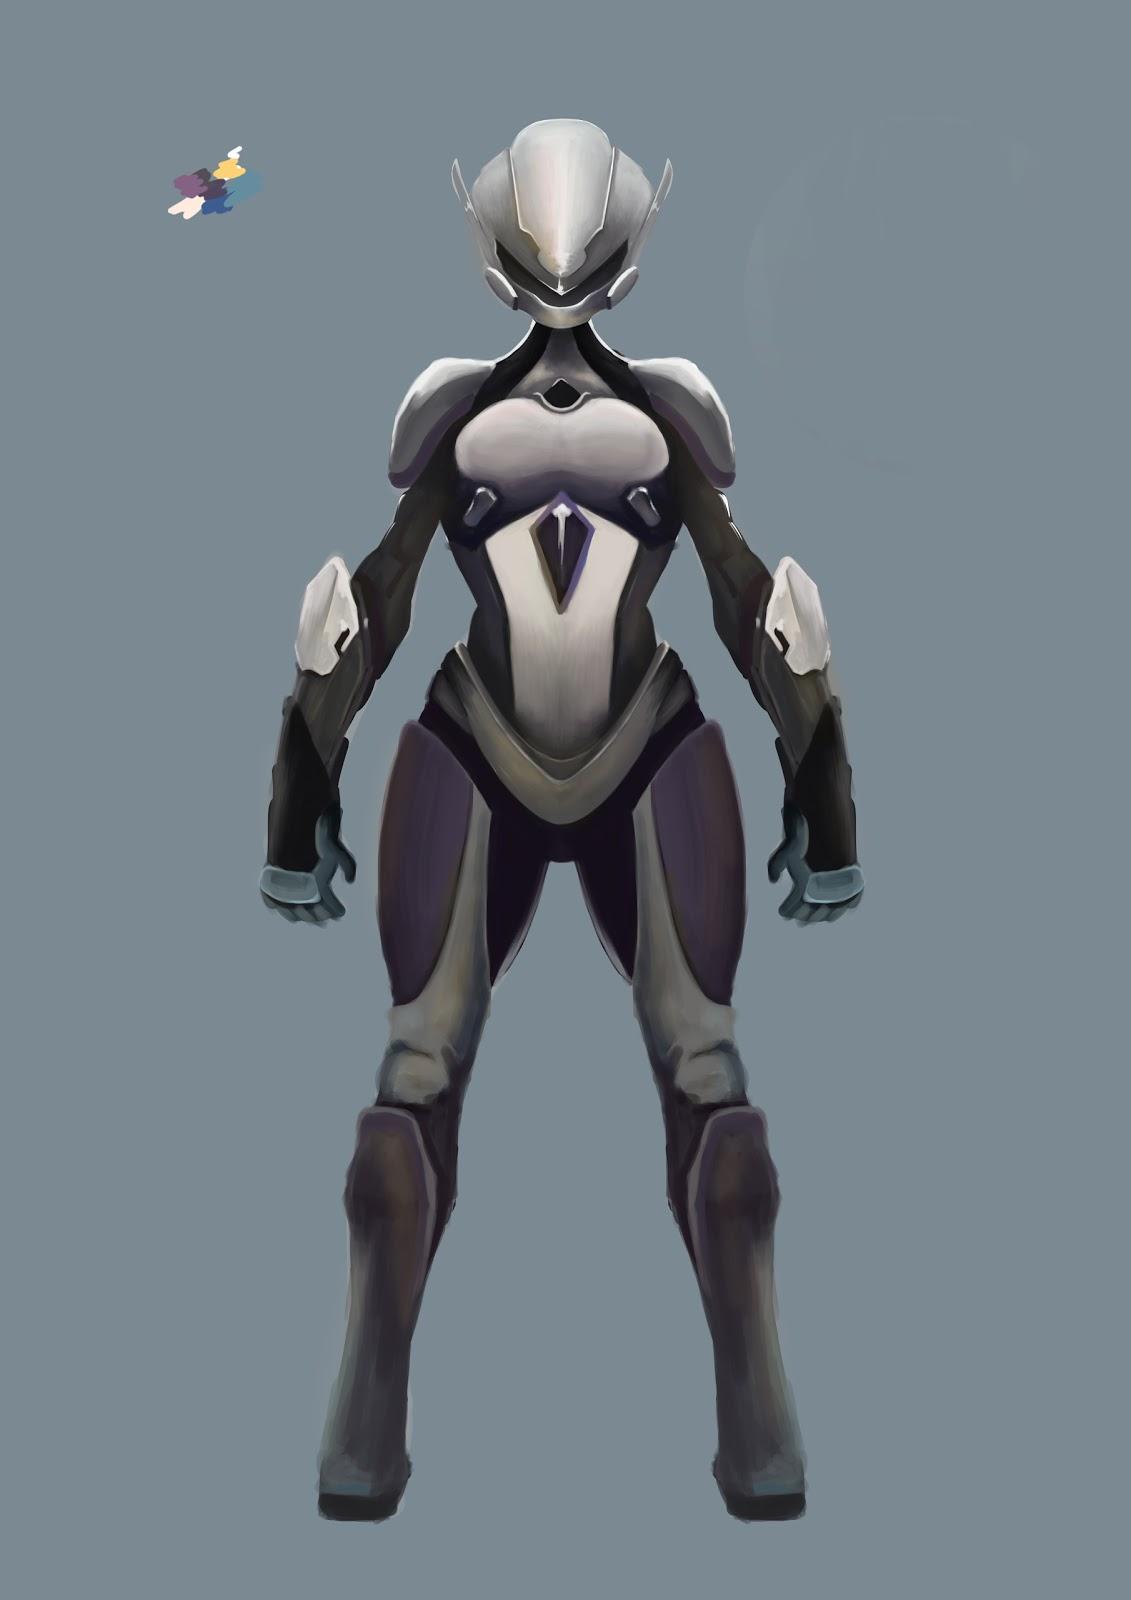 Armure Futuriste melting drawz: concept armure futuriste